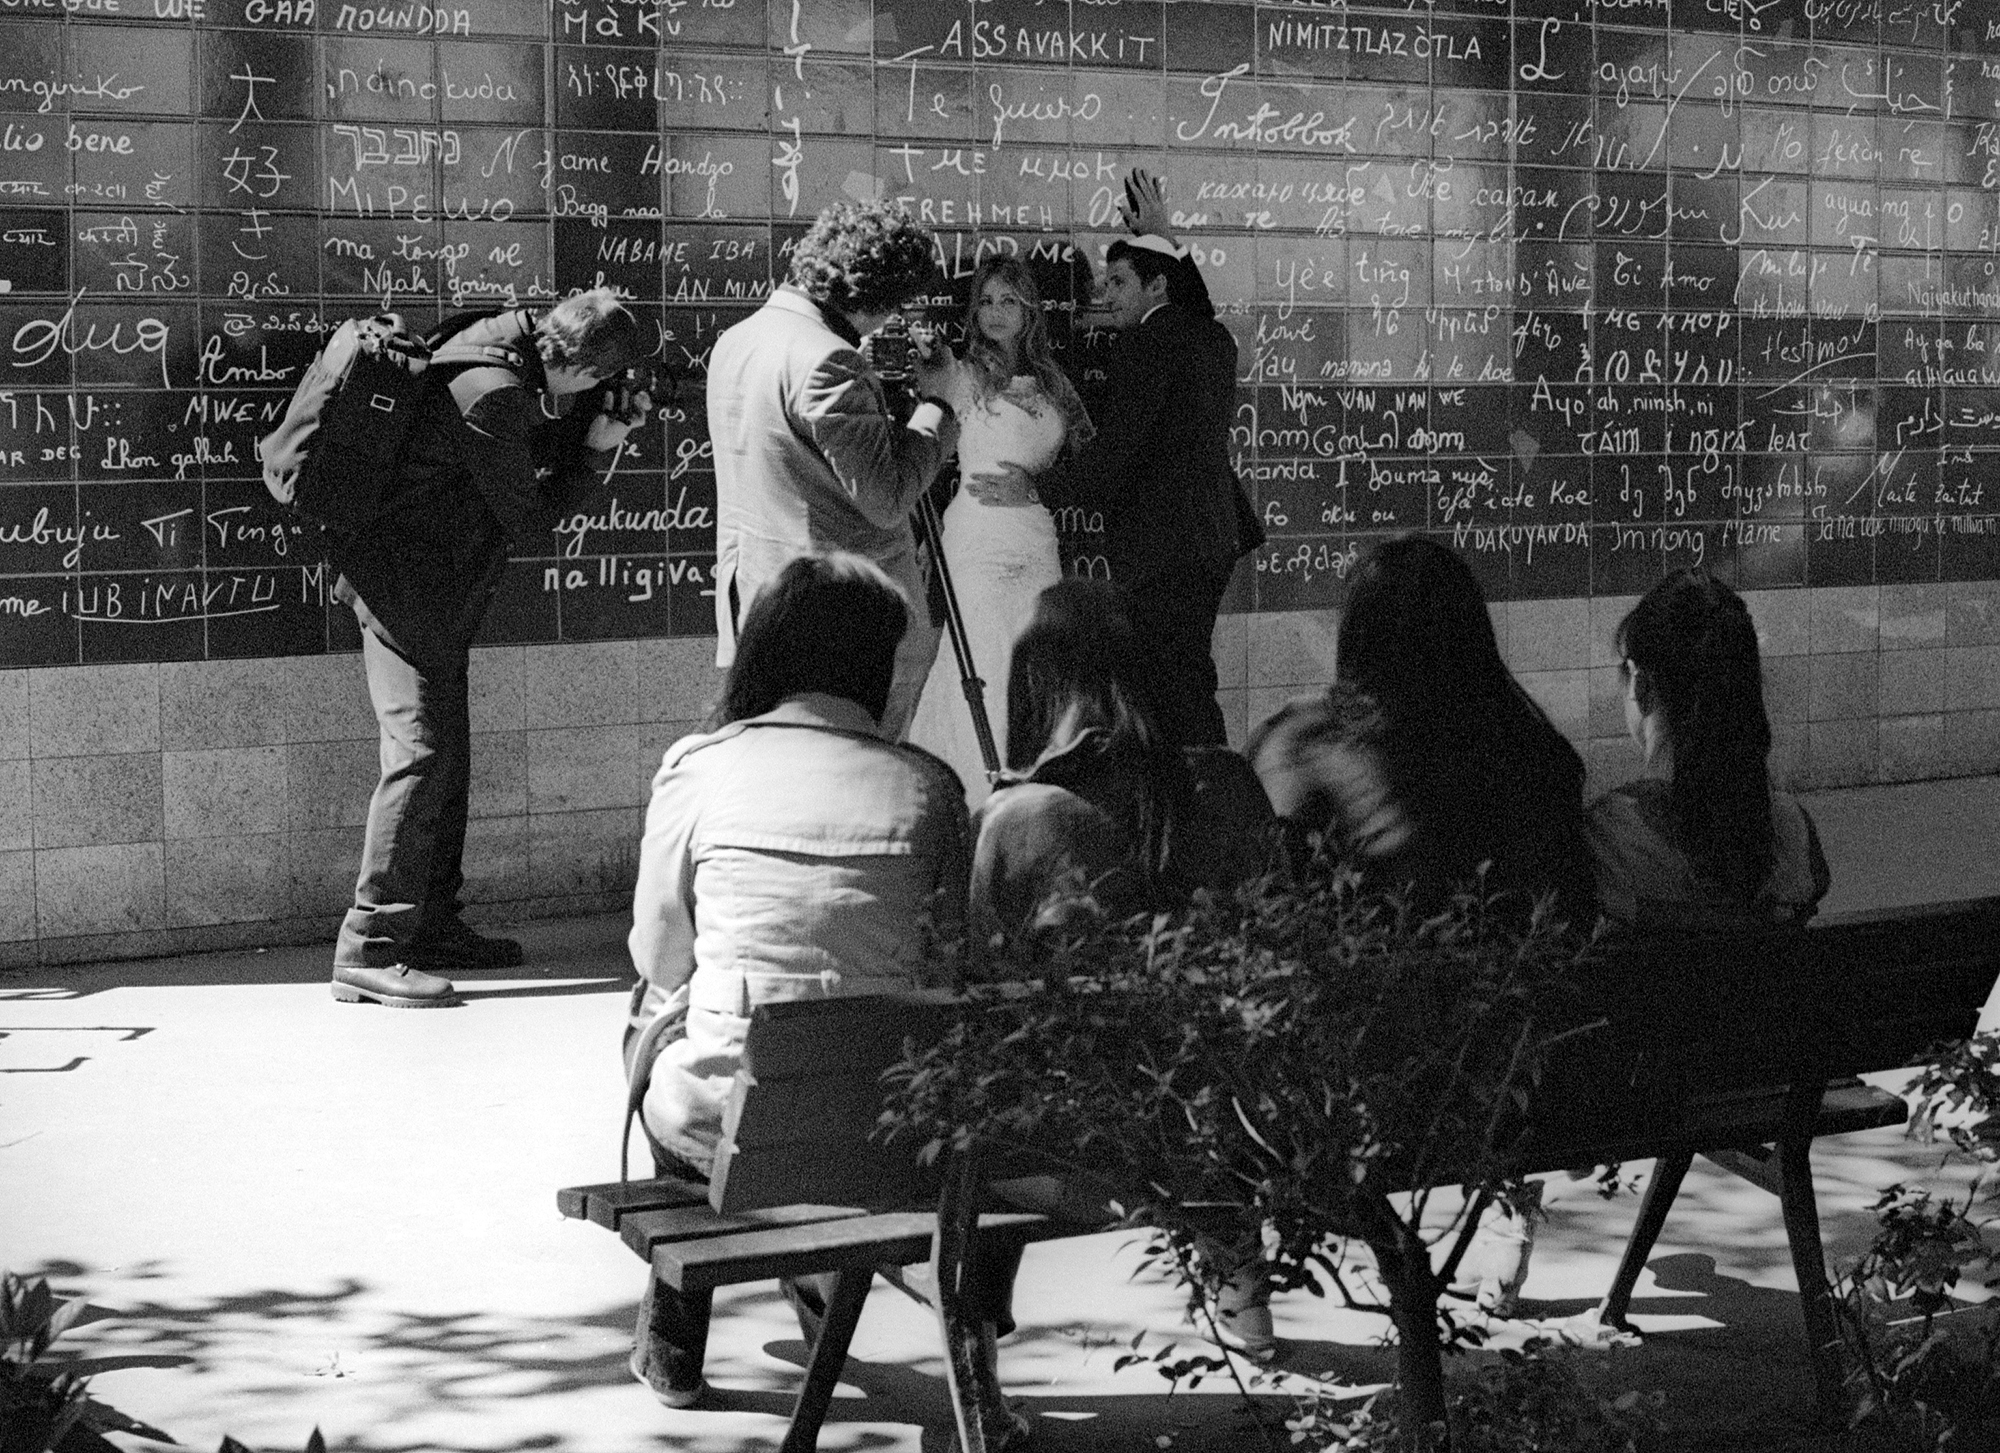 Matrimonial-moment.jpg